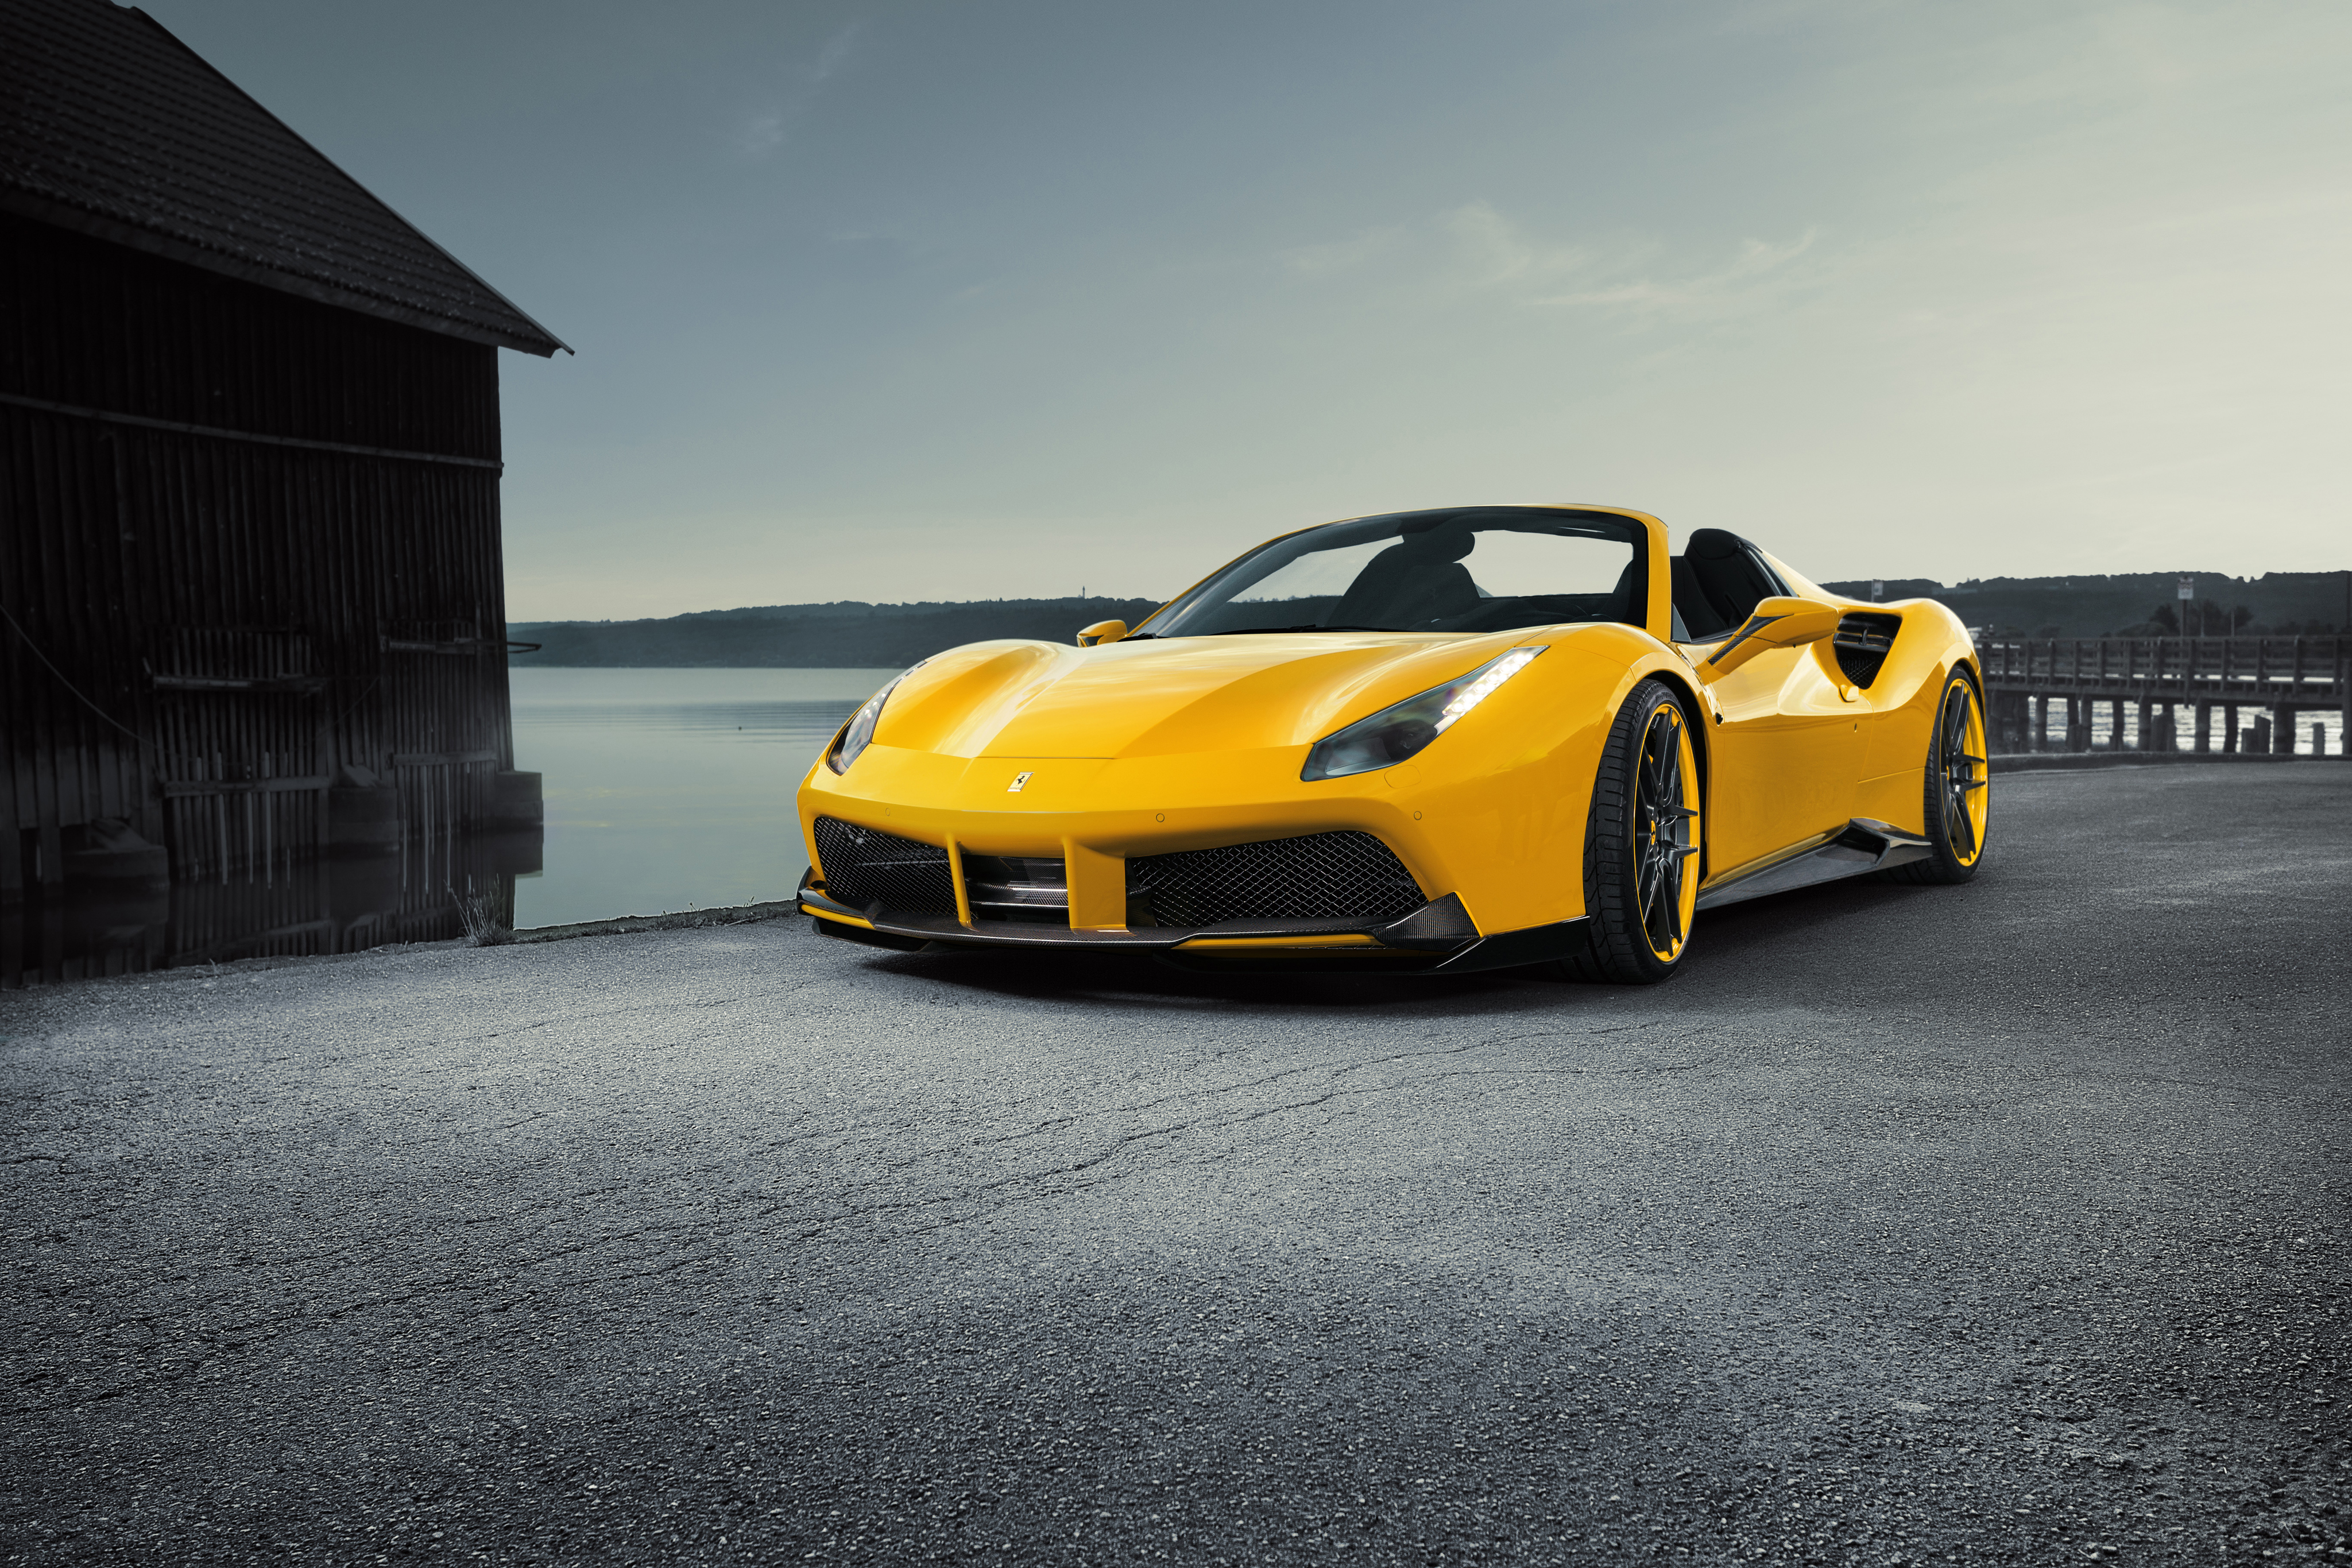 Novitec Ferrari Spider 488 Yellow Roadster, HD Cars, 4k ...